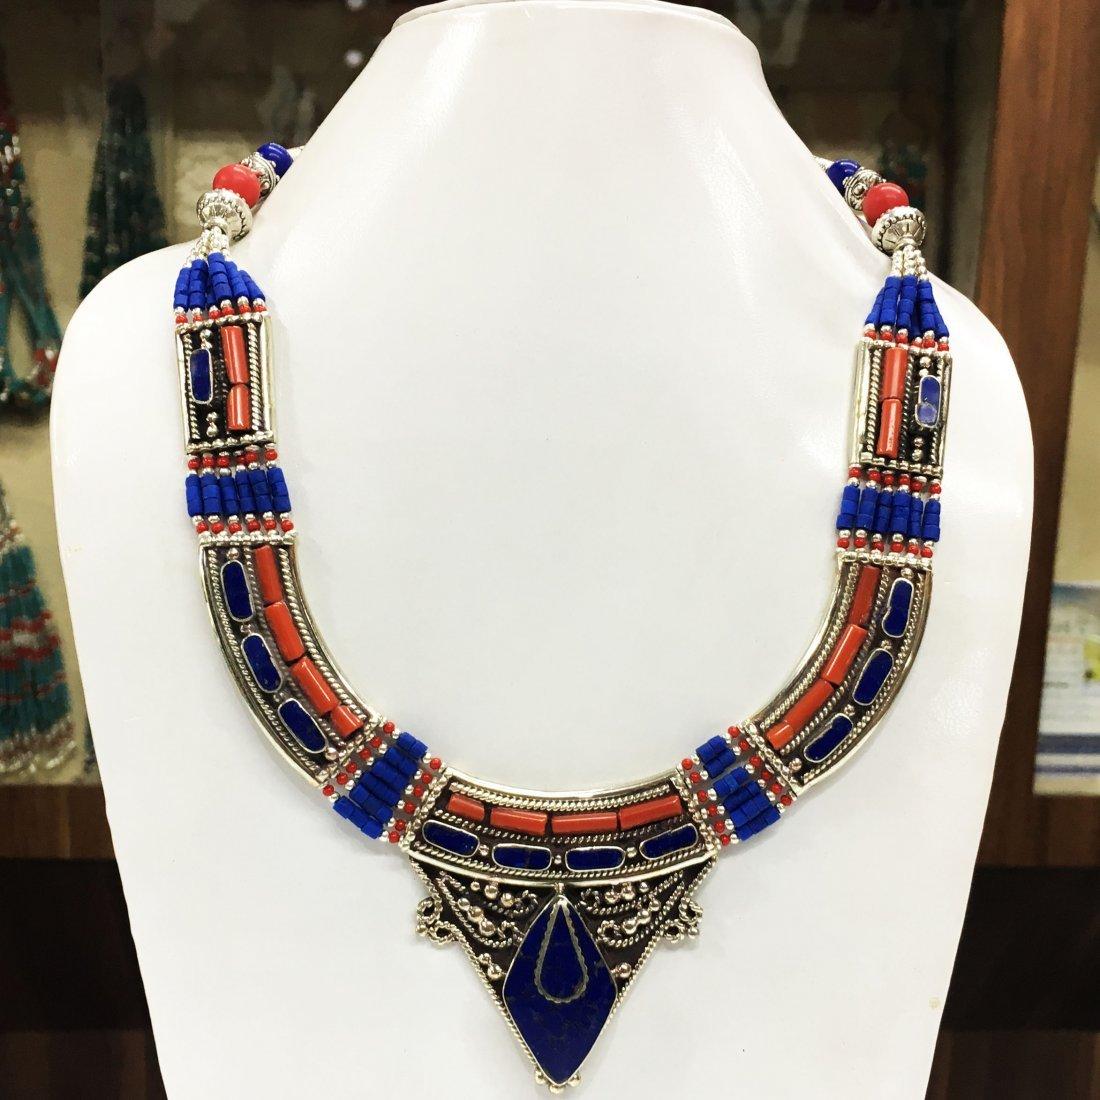 New Arrival - Tibetan Handmade Lapis & Coral Necklace